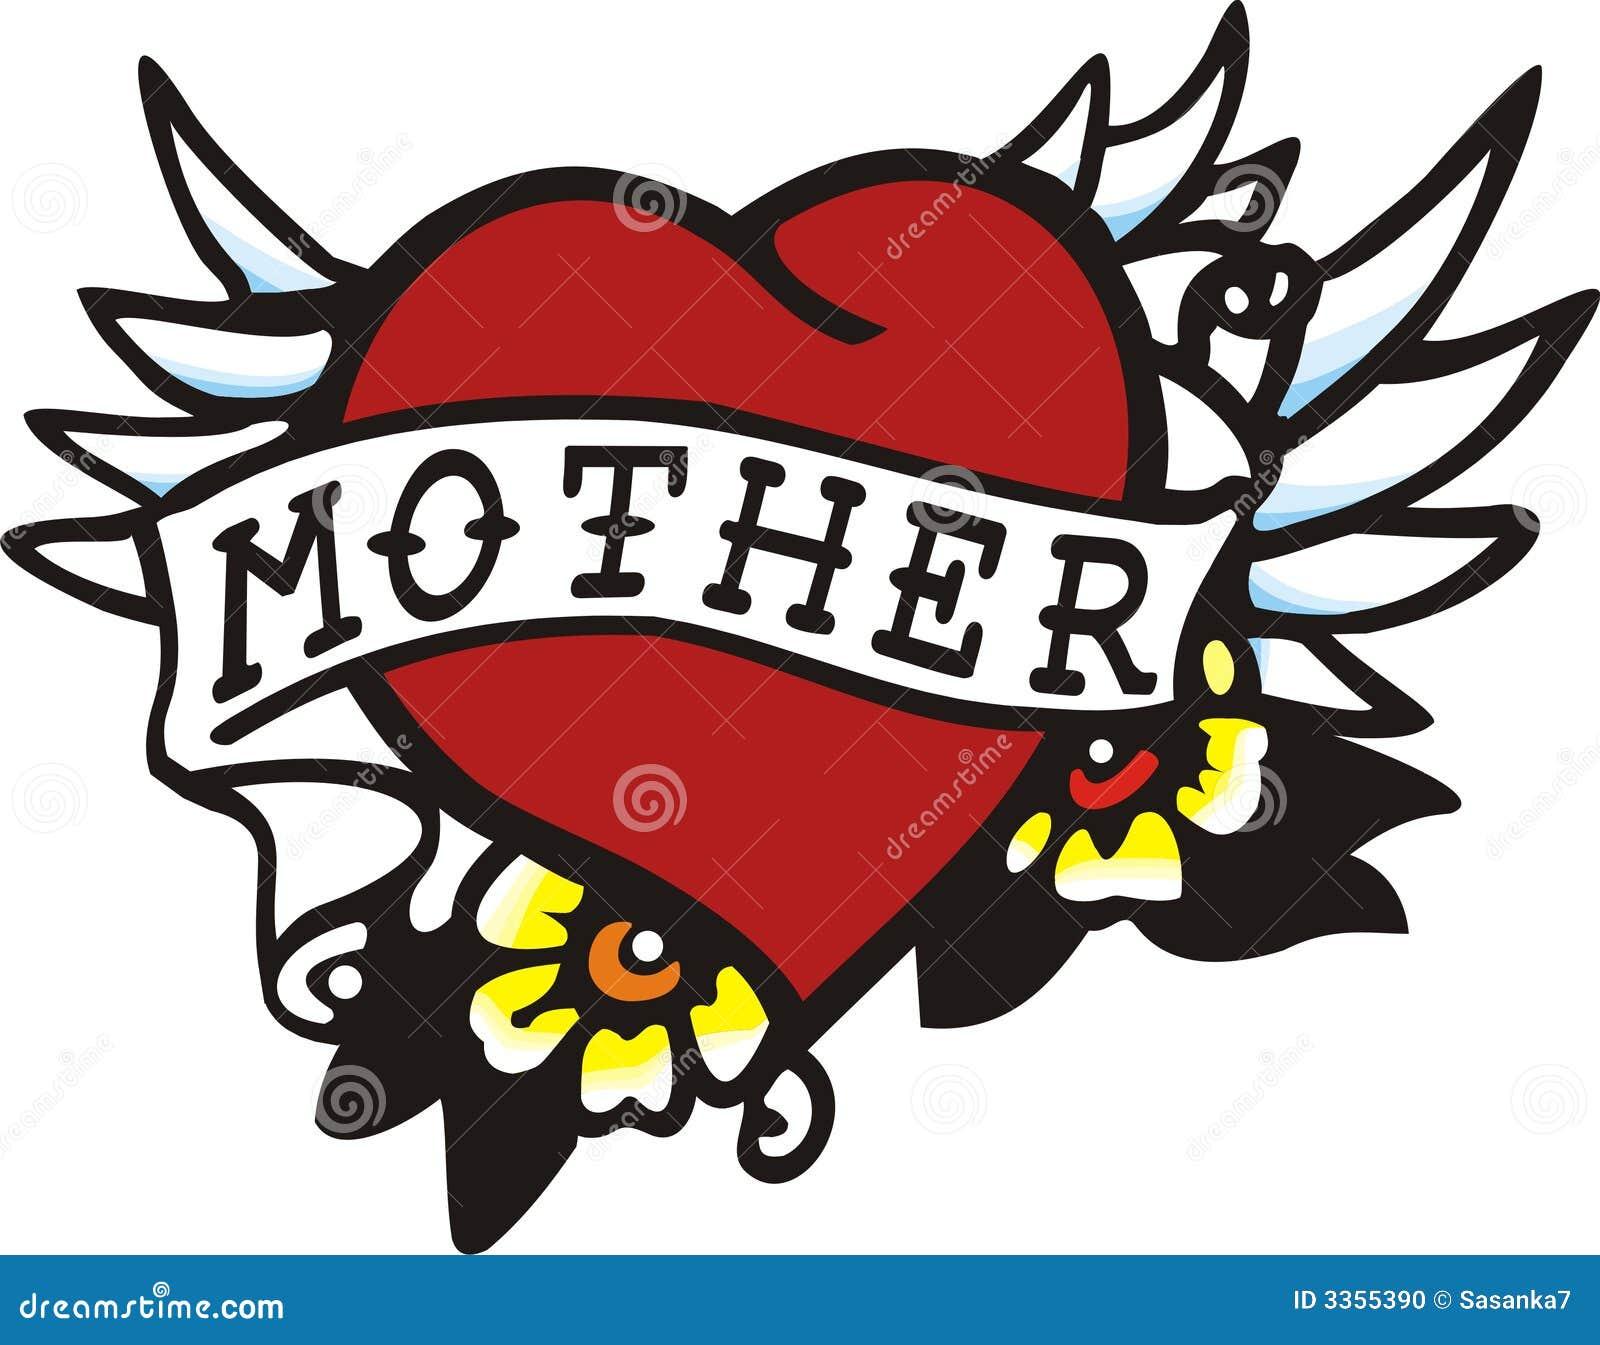 Madre del corazón